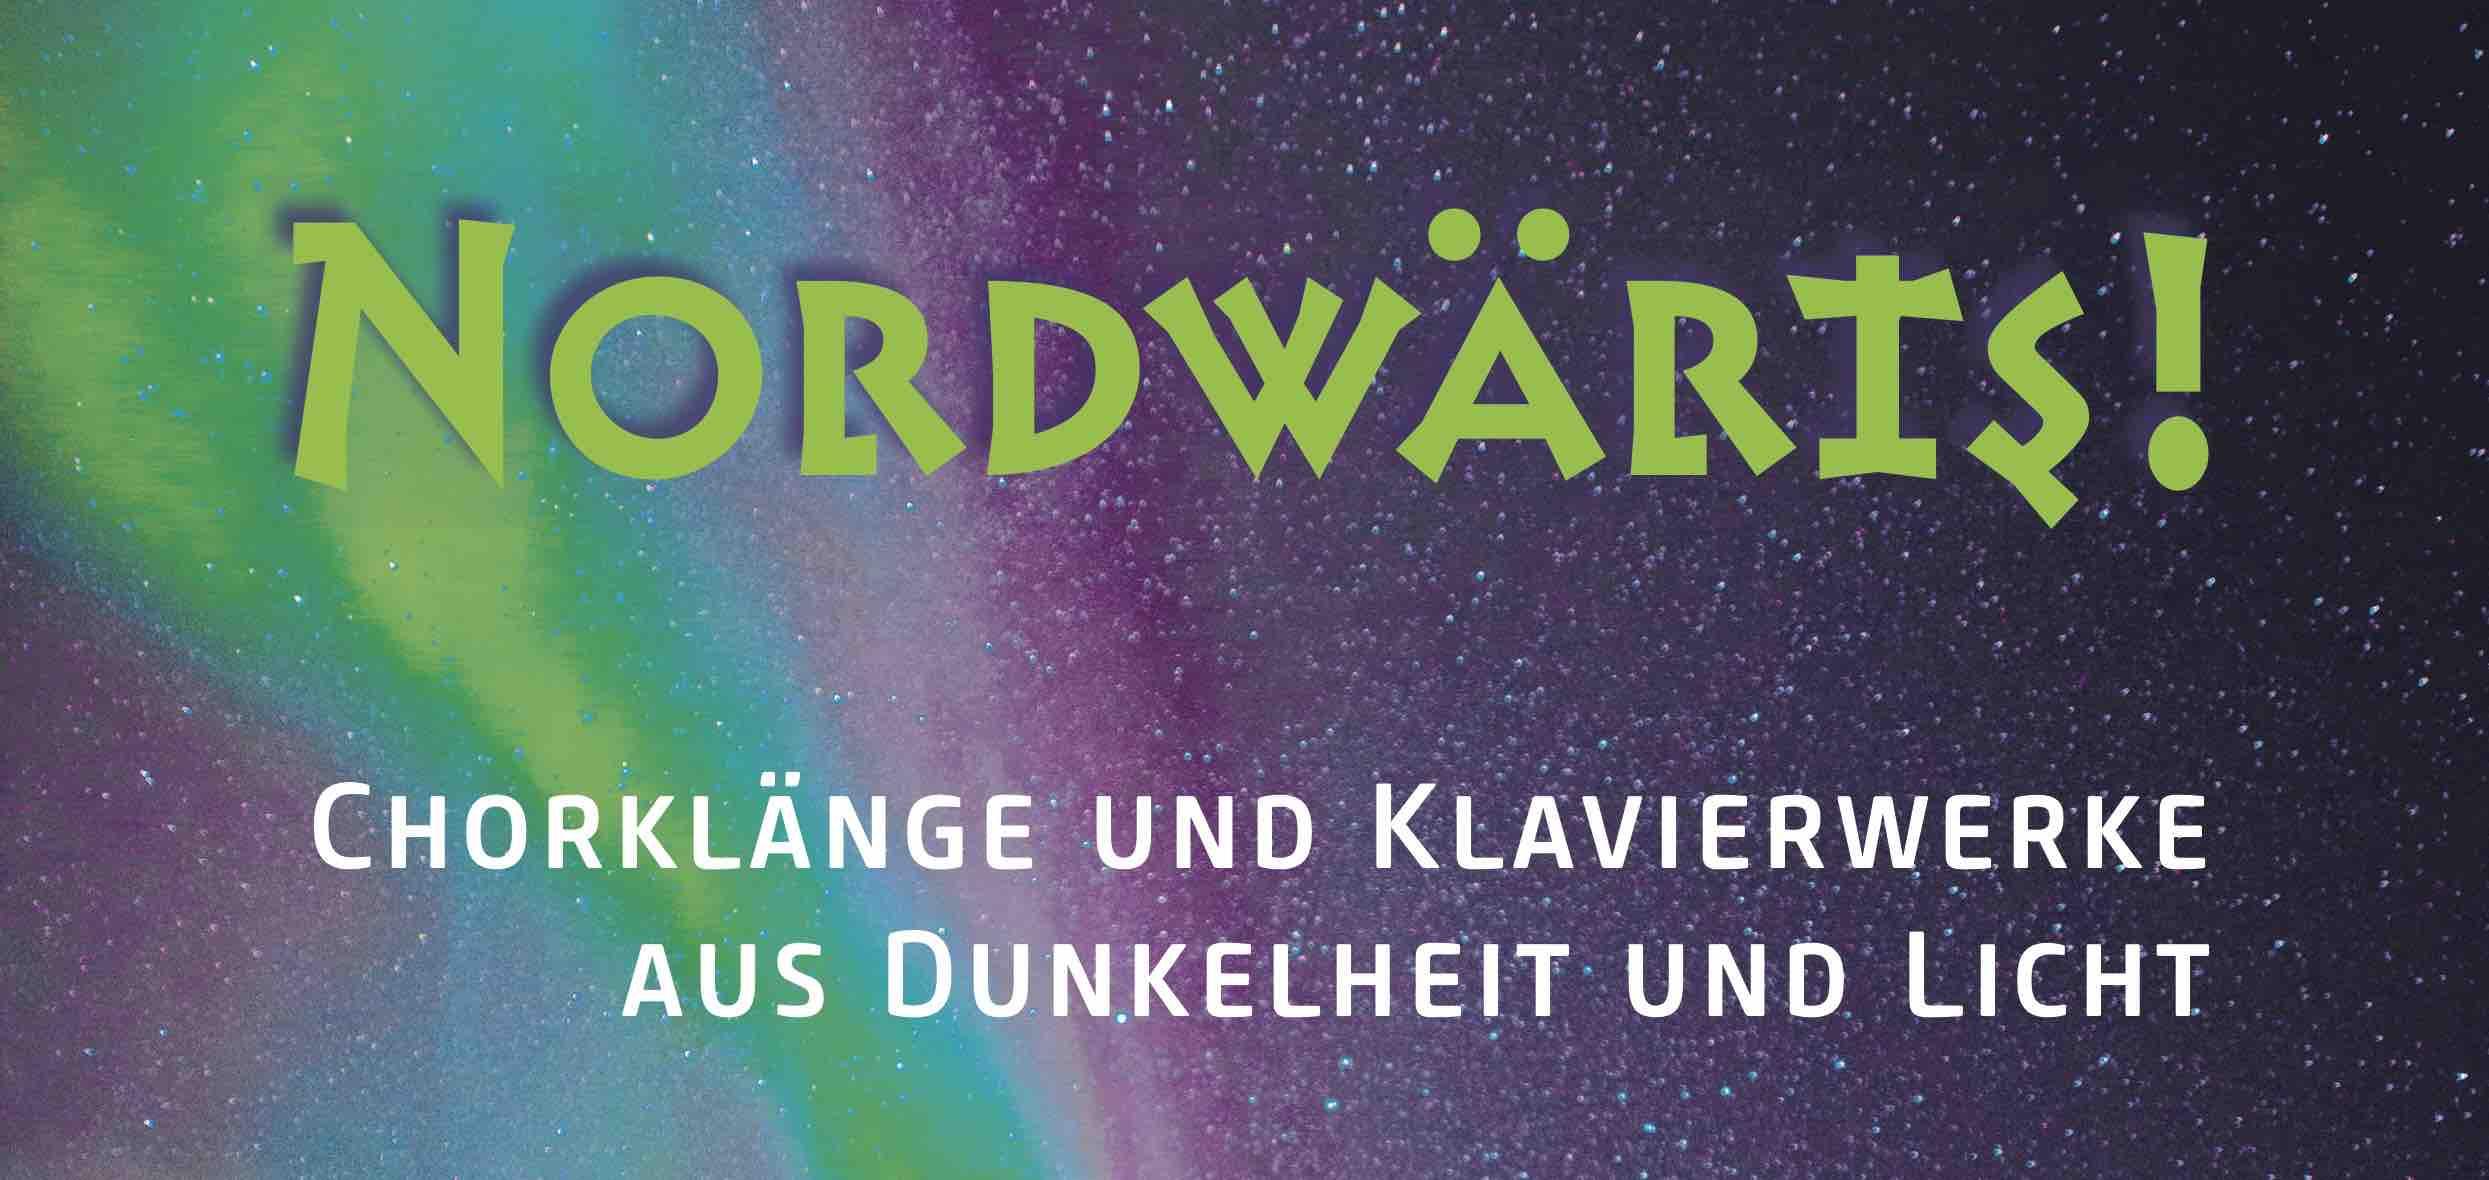 Konzert Plakat Nordwärts! Chorensemble Frauenstimmen